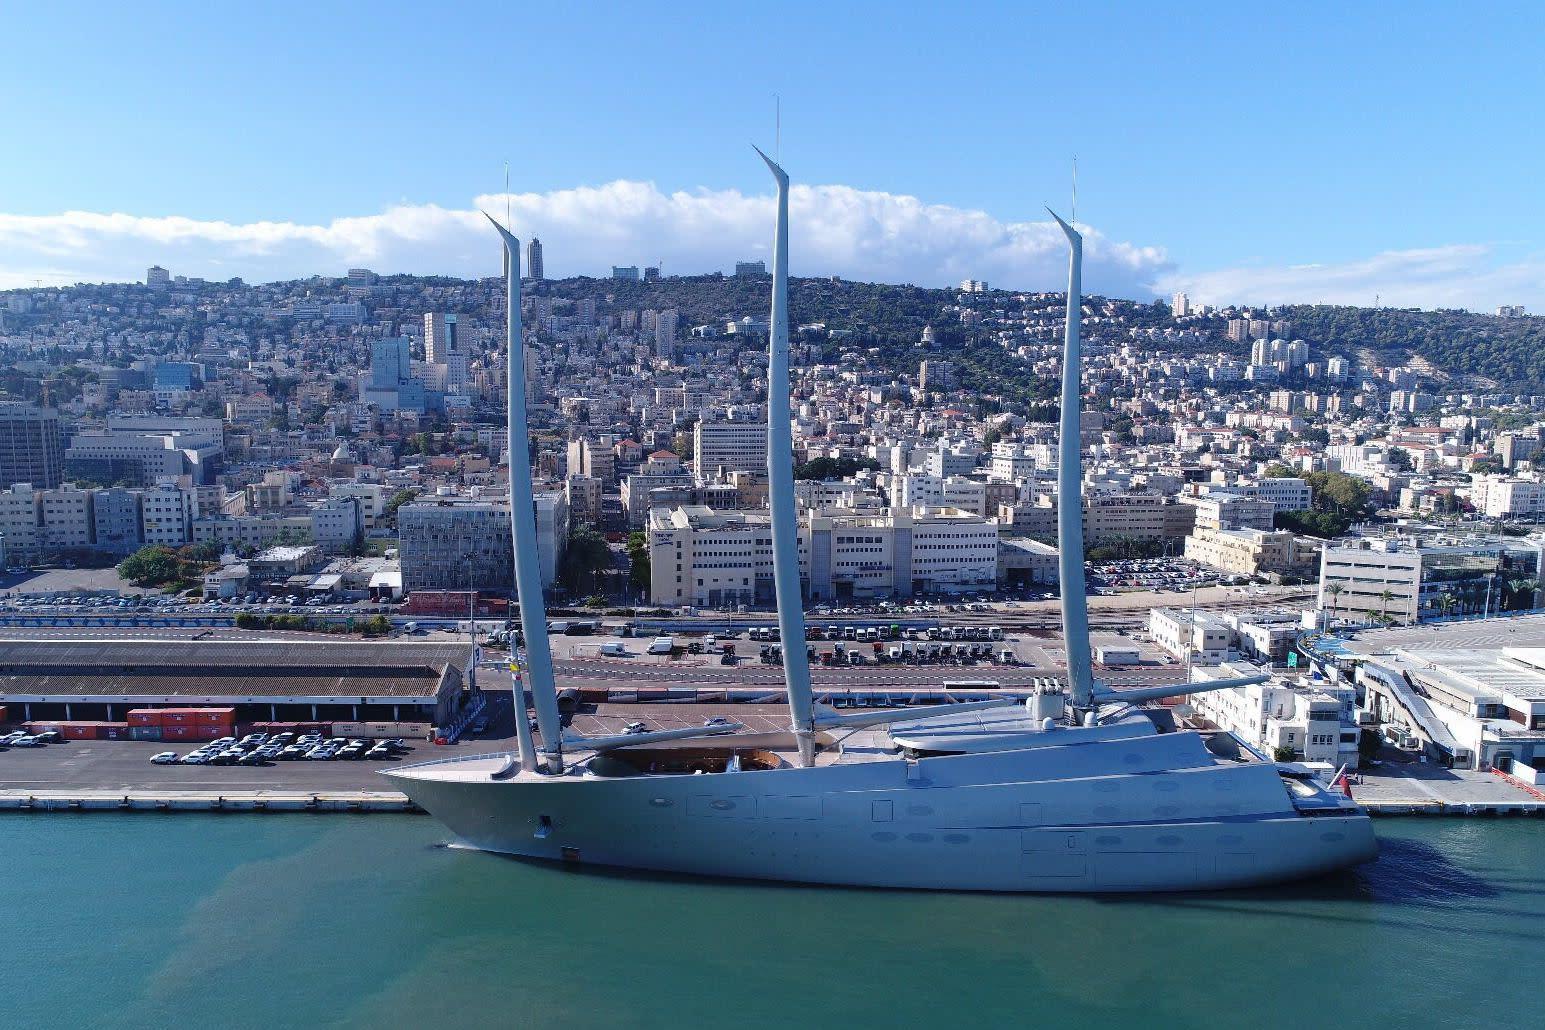 Mega Yacht Docks In Haifa Photo Credit GEDRONES